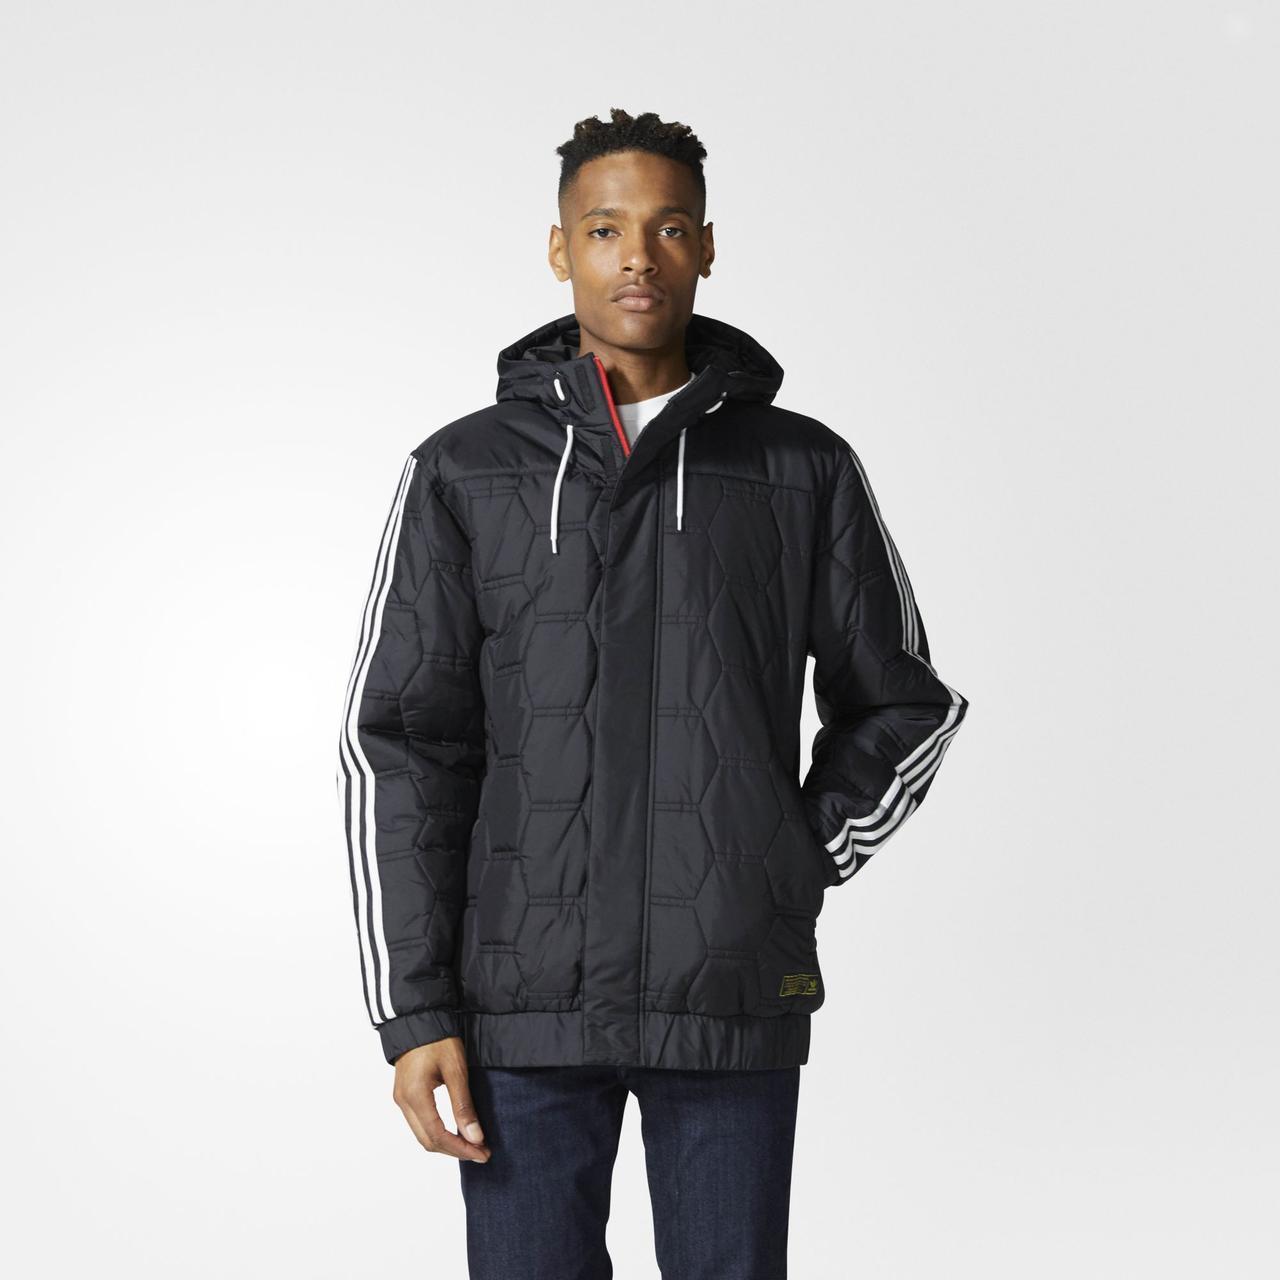 be9fa9e1b0bd Мужская куртка Adidas Originals Puff (Артикул  BR4014) - Интернет-магазин  «Эксперт